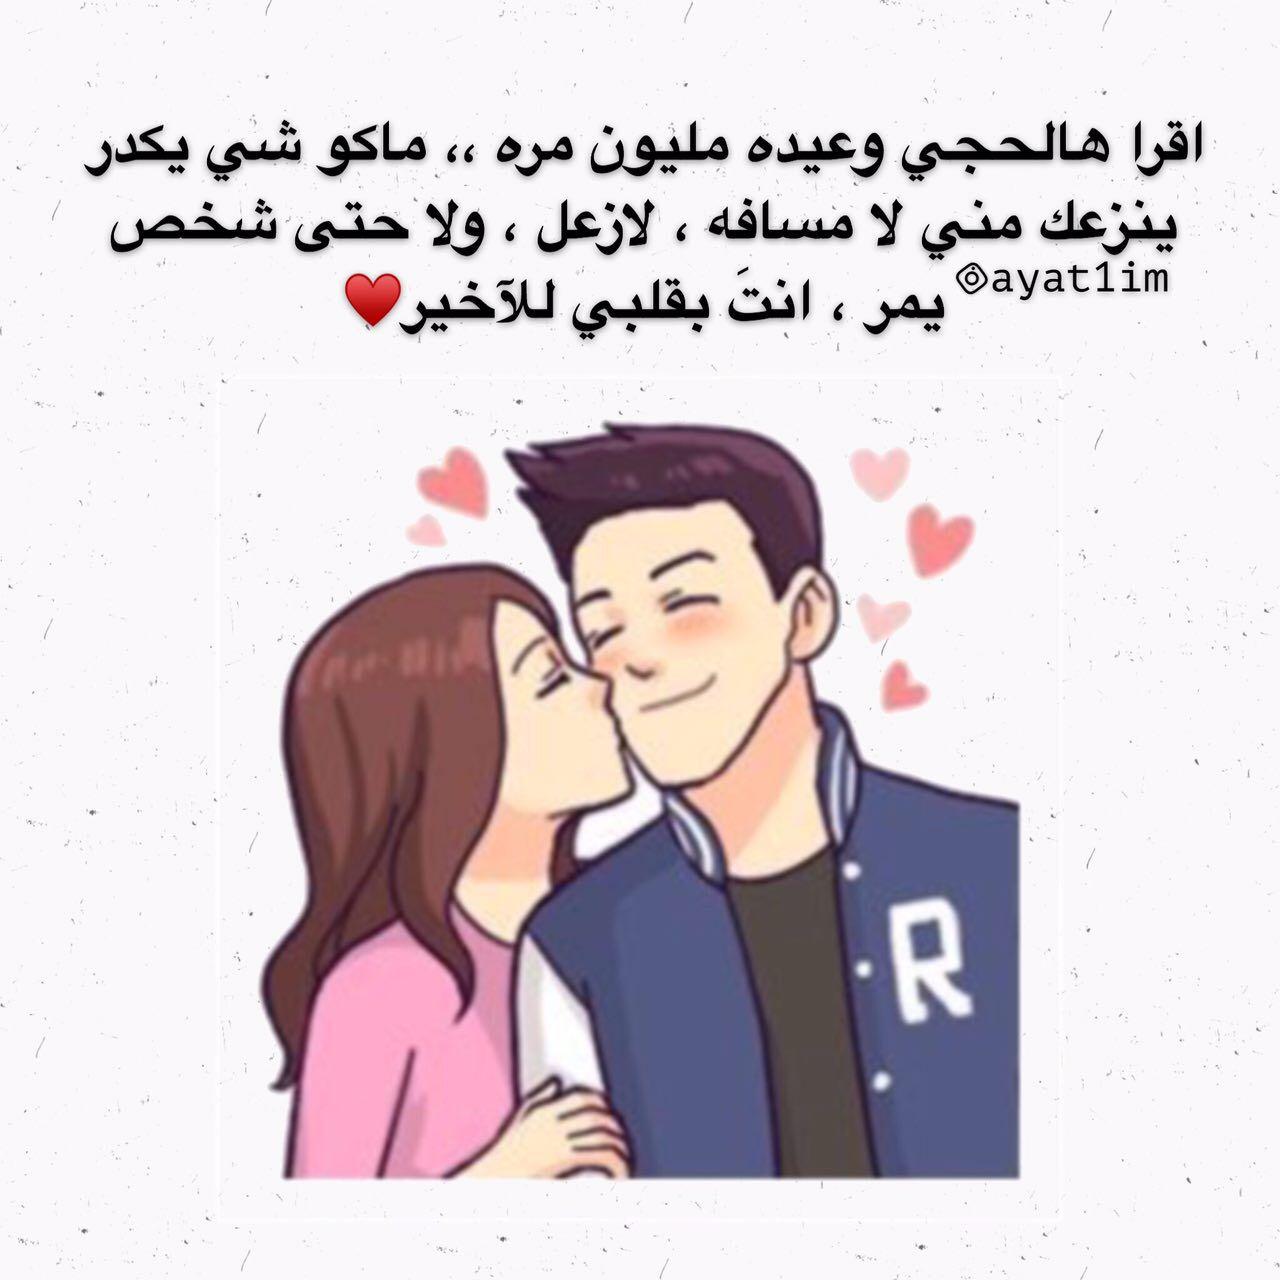 Pin By گرزآيهہ On رمزيات Romantic Words Islamic Love Quotes Arabic Love Quotes